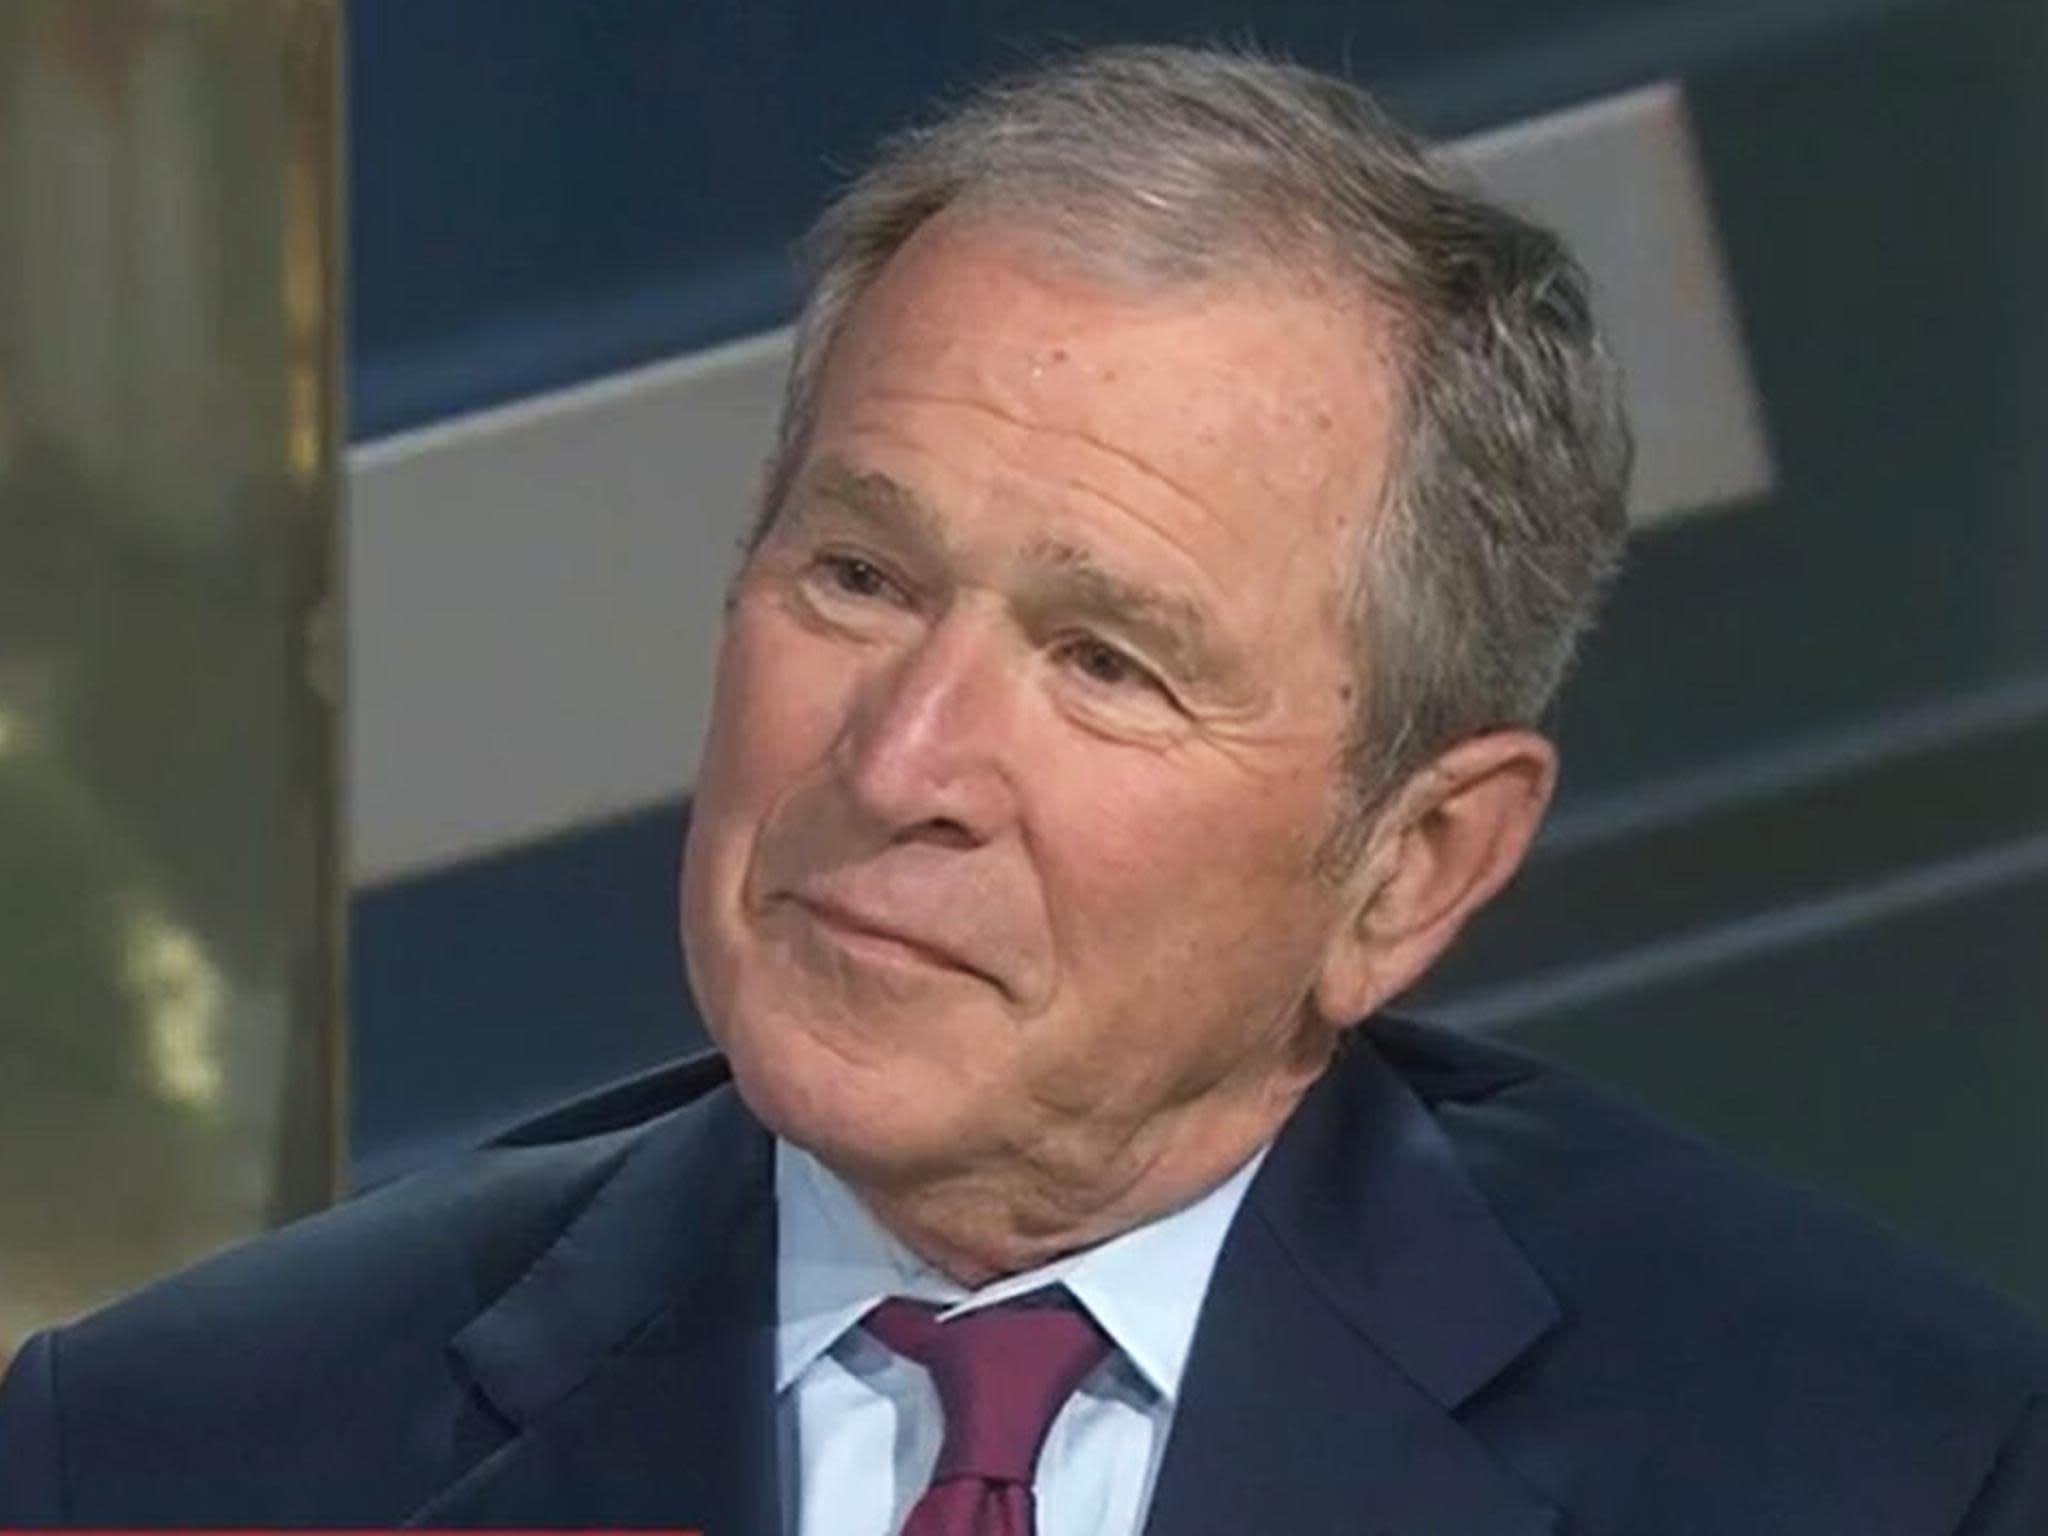 George W Bush says he's 'disturbed' by immigration rhetoric under Trump